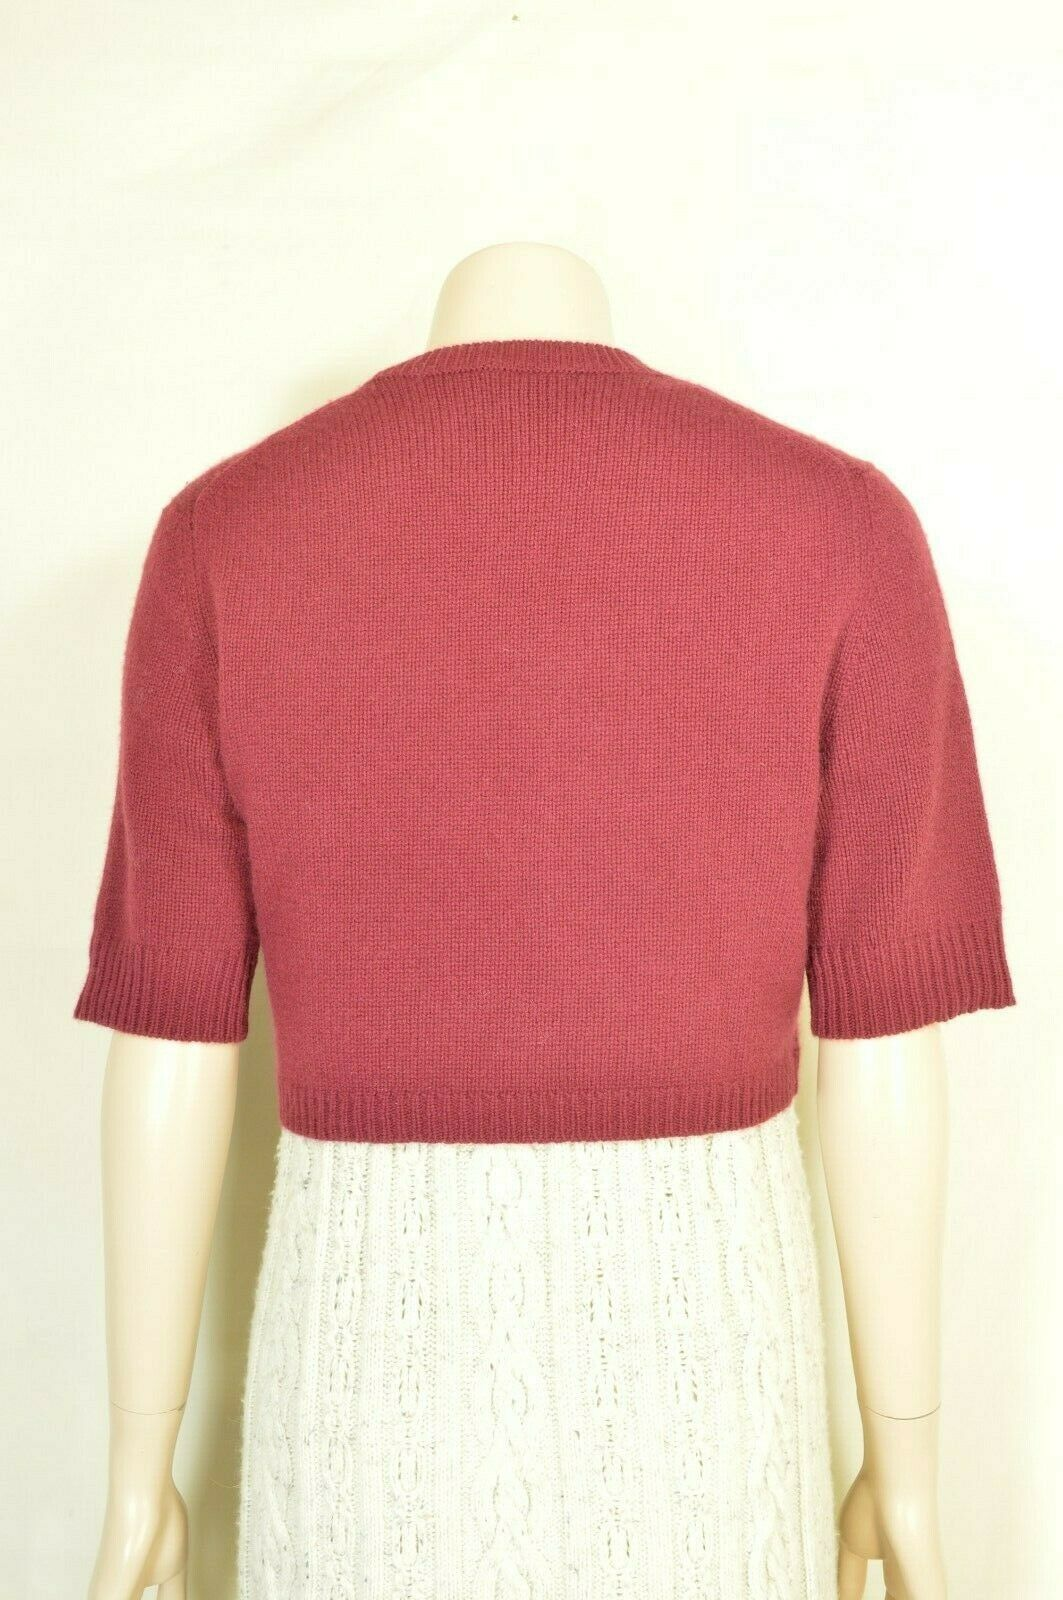 Neiman Marcus sweater M NWT red 100% cashmere shrug bolero cropped $195 new image 12